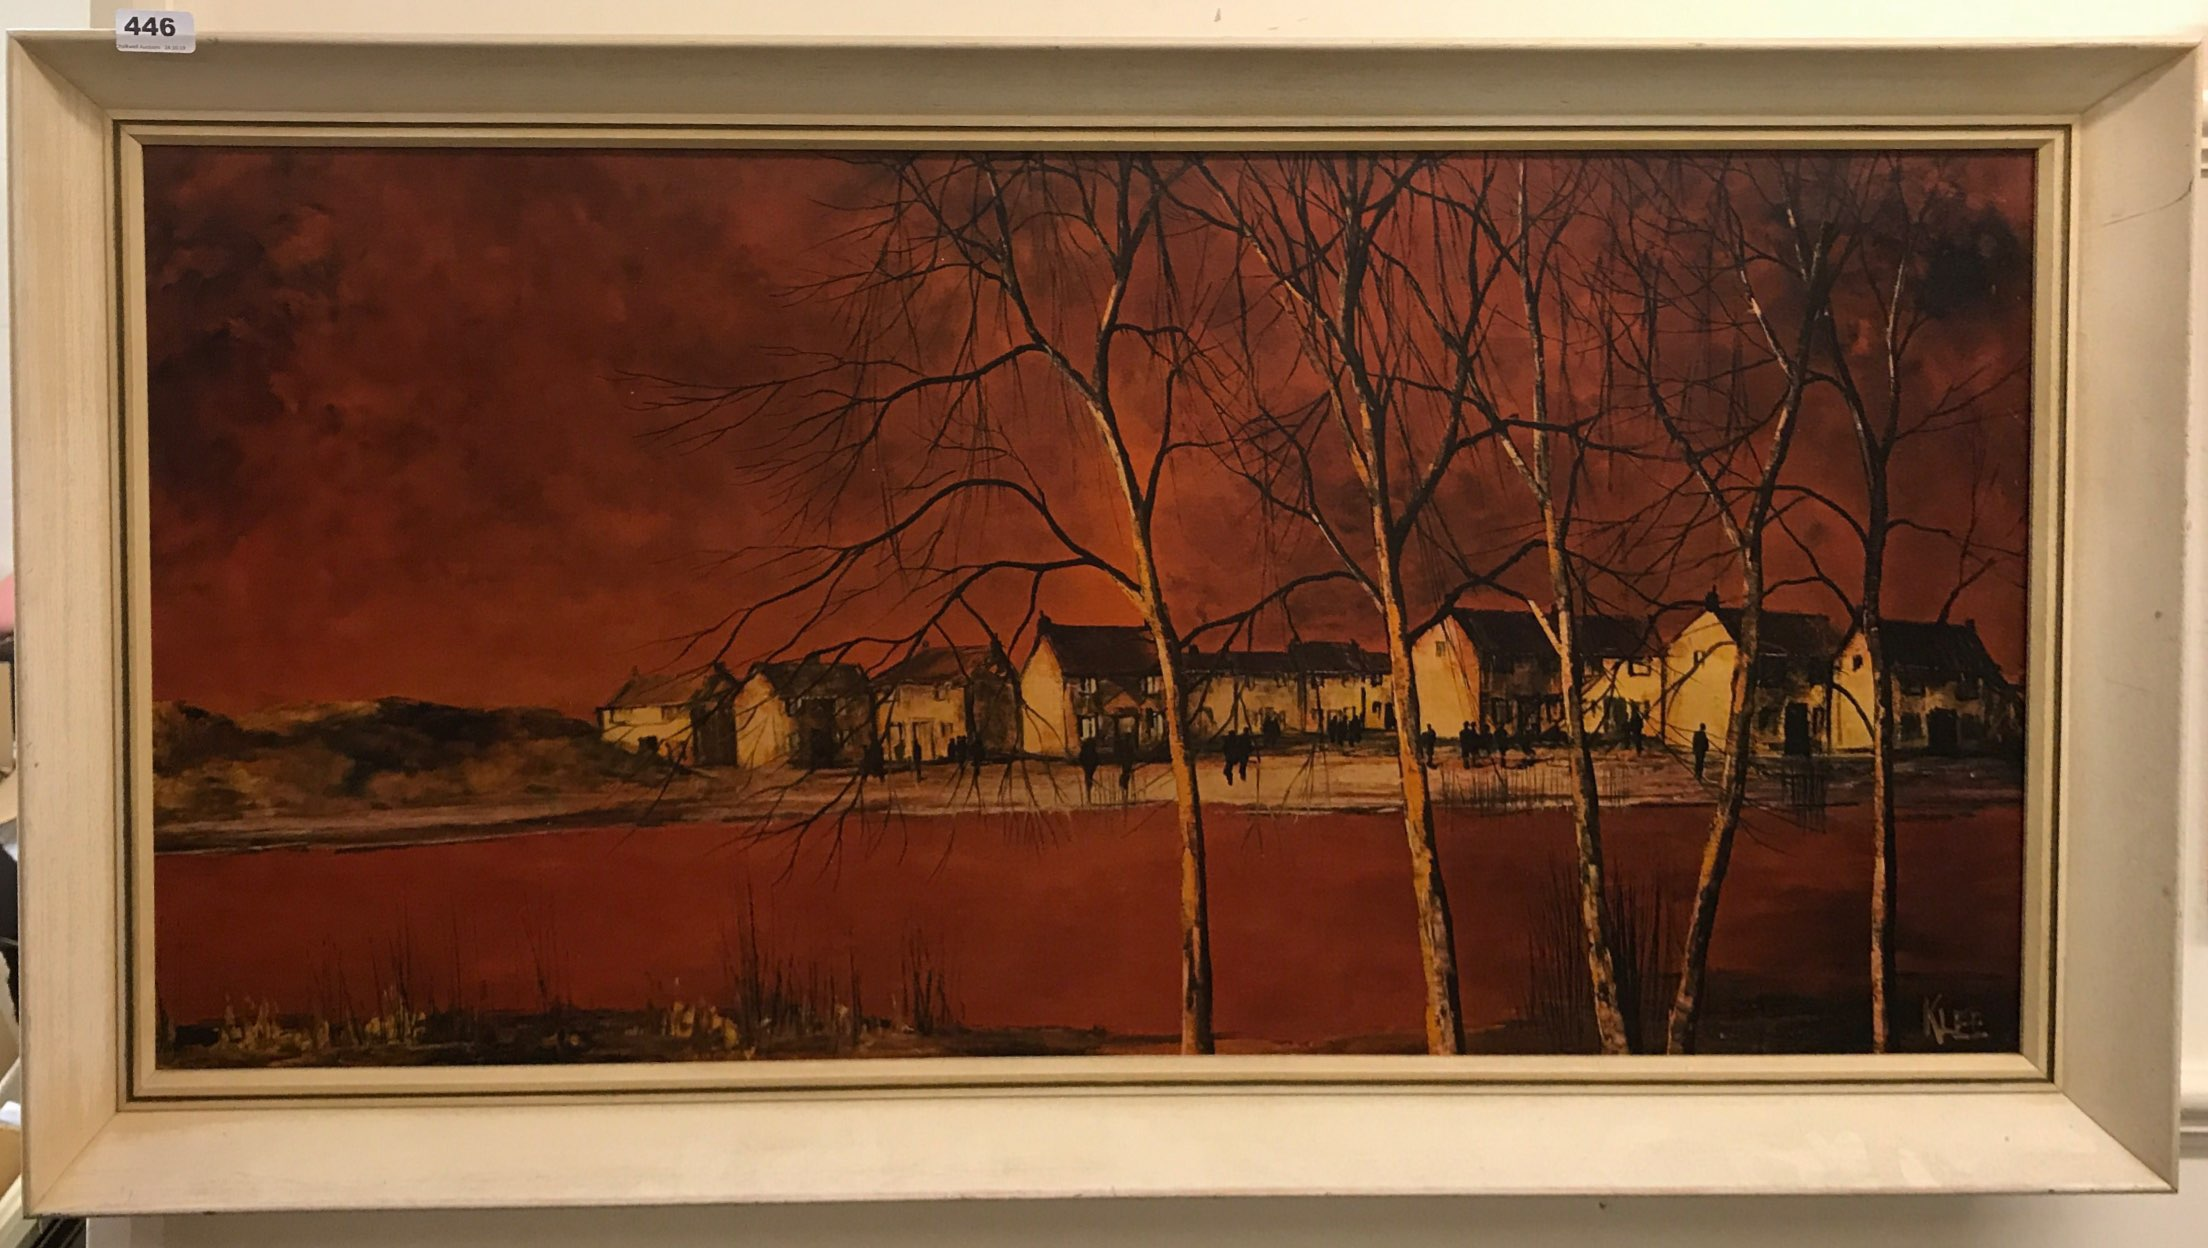 Lot 446 - A 1960's framed print by Paul Klee, framed size 109 x 60cm.